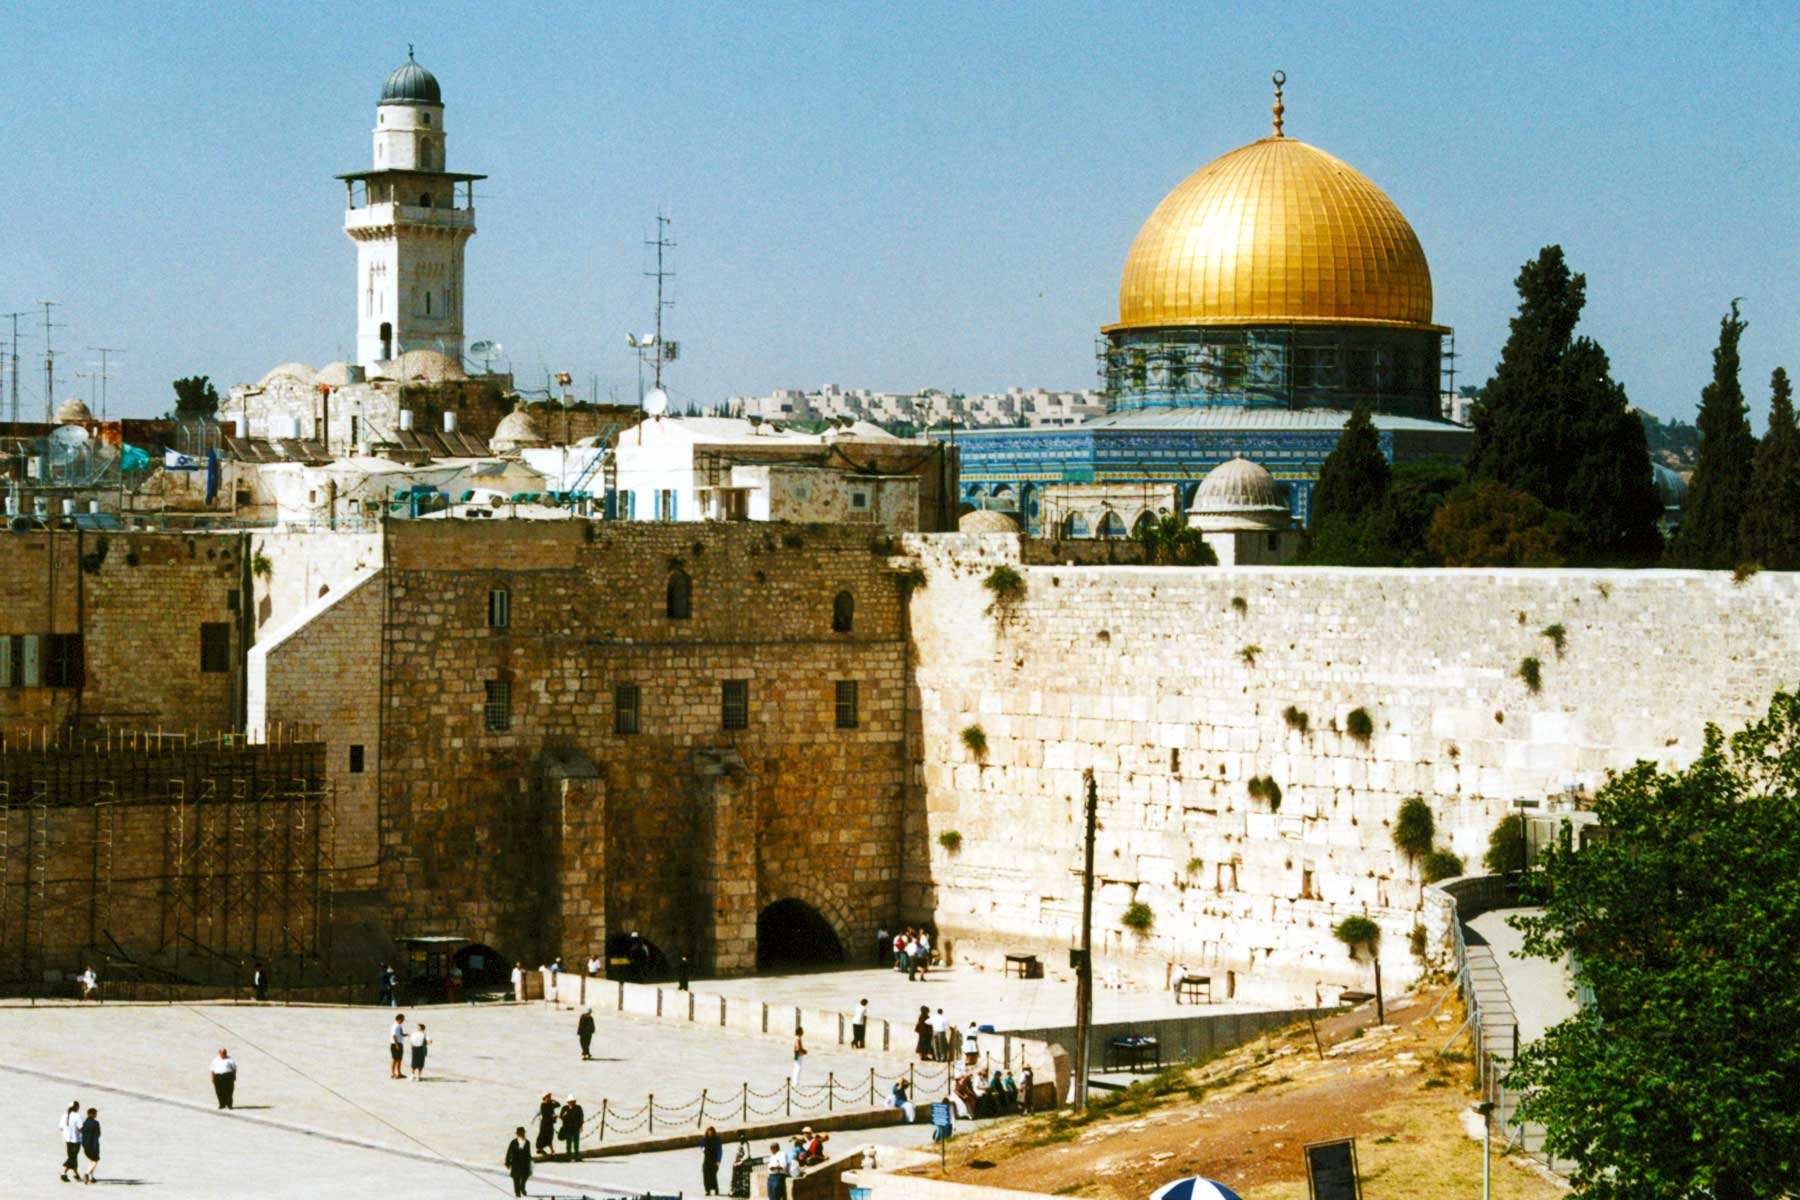 Western Wall | Temple Mount | Jerusalem | Israel | Dr Steven A Martin | International Education Online | Steven Andrew Martin